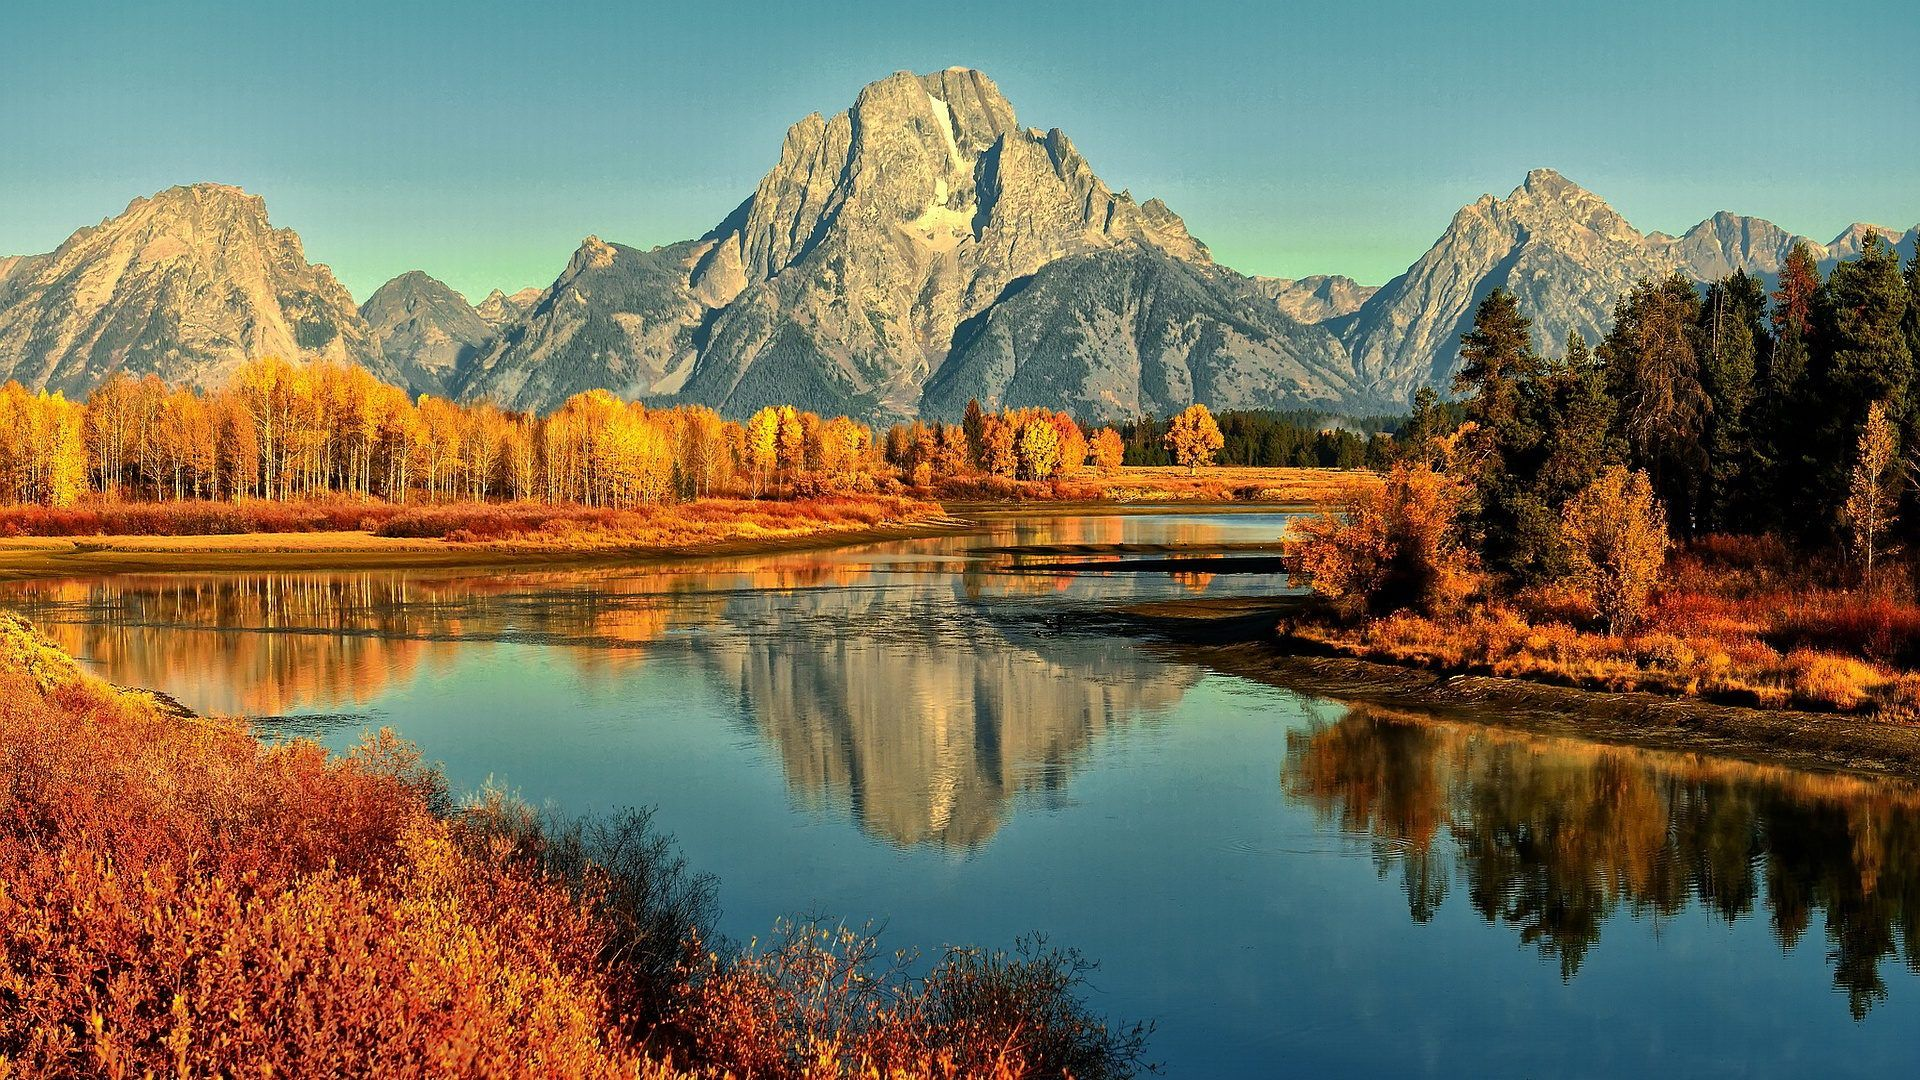 Autumn Wallpapers Desktop Scenery Wallpaper Nature Nature Pictures